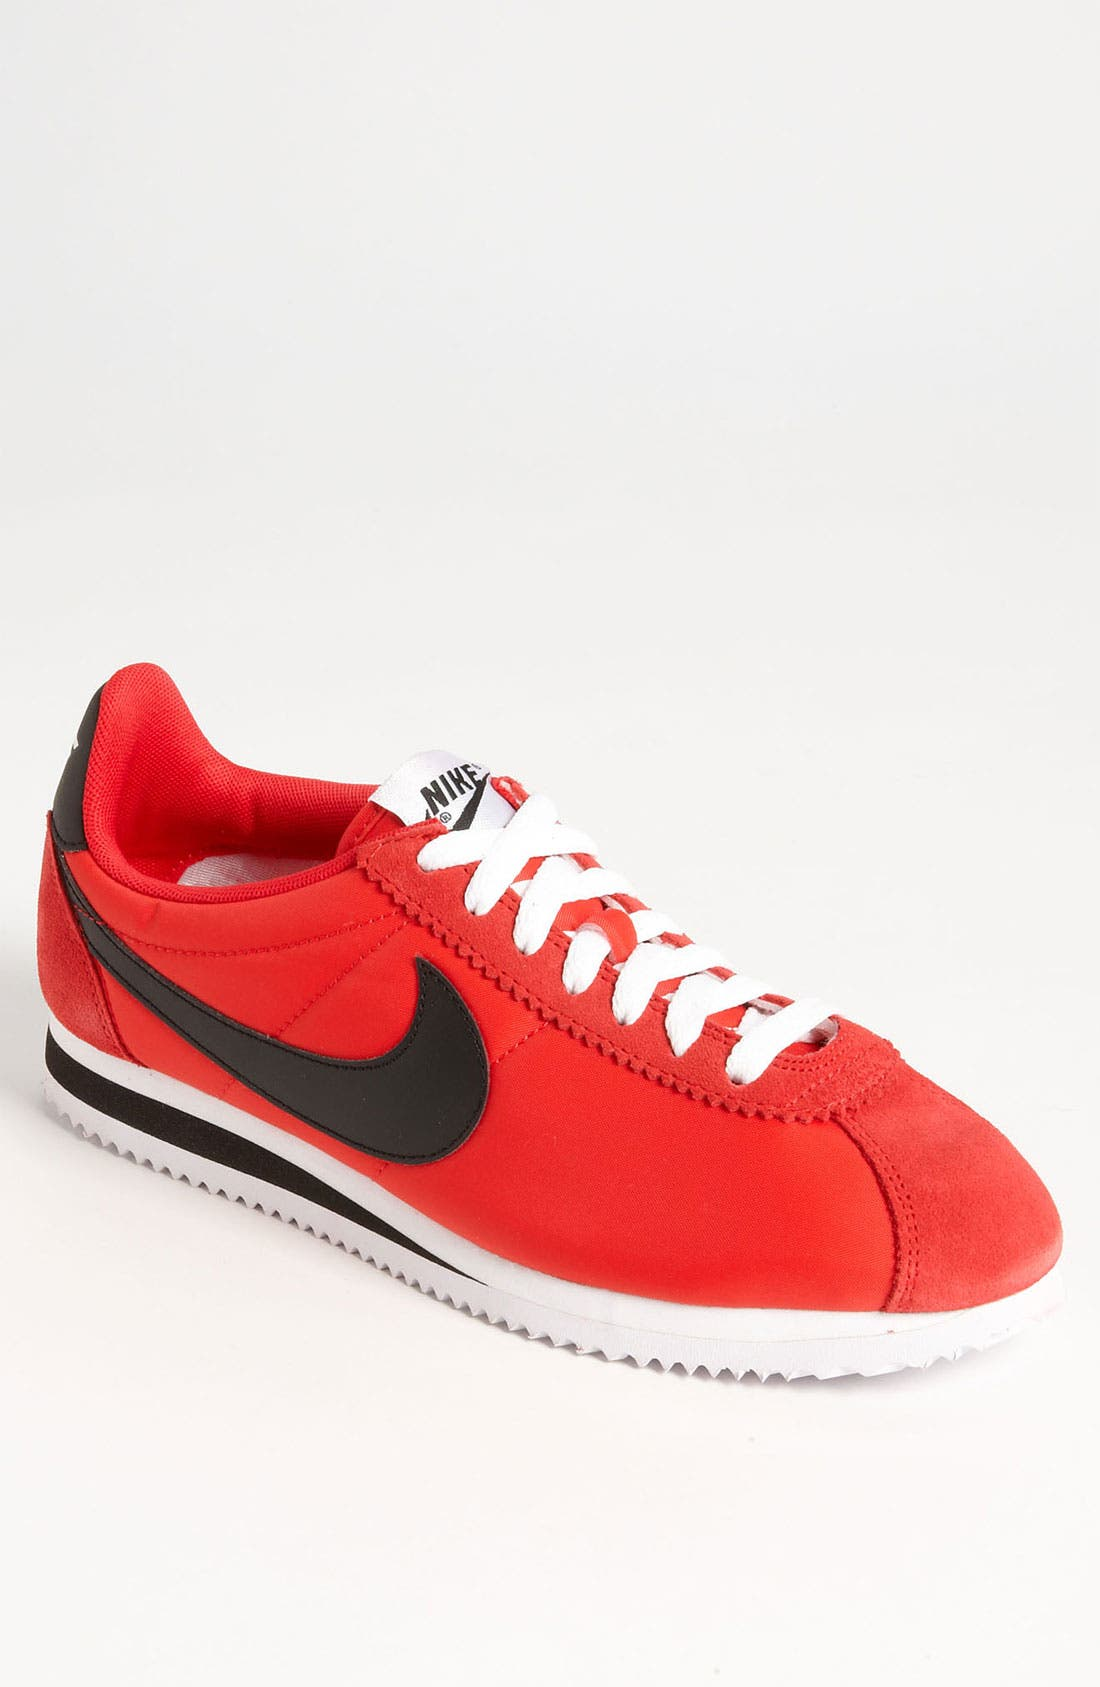 Main Image - Nike 'Classic Cortez' Sneaker (Men)